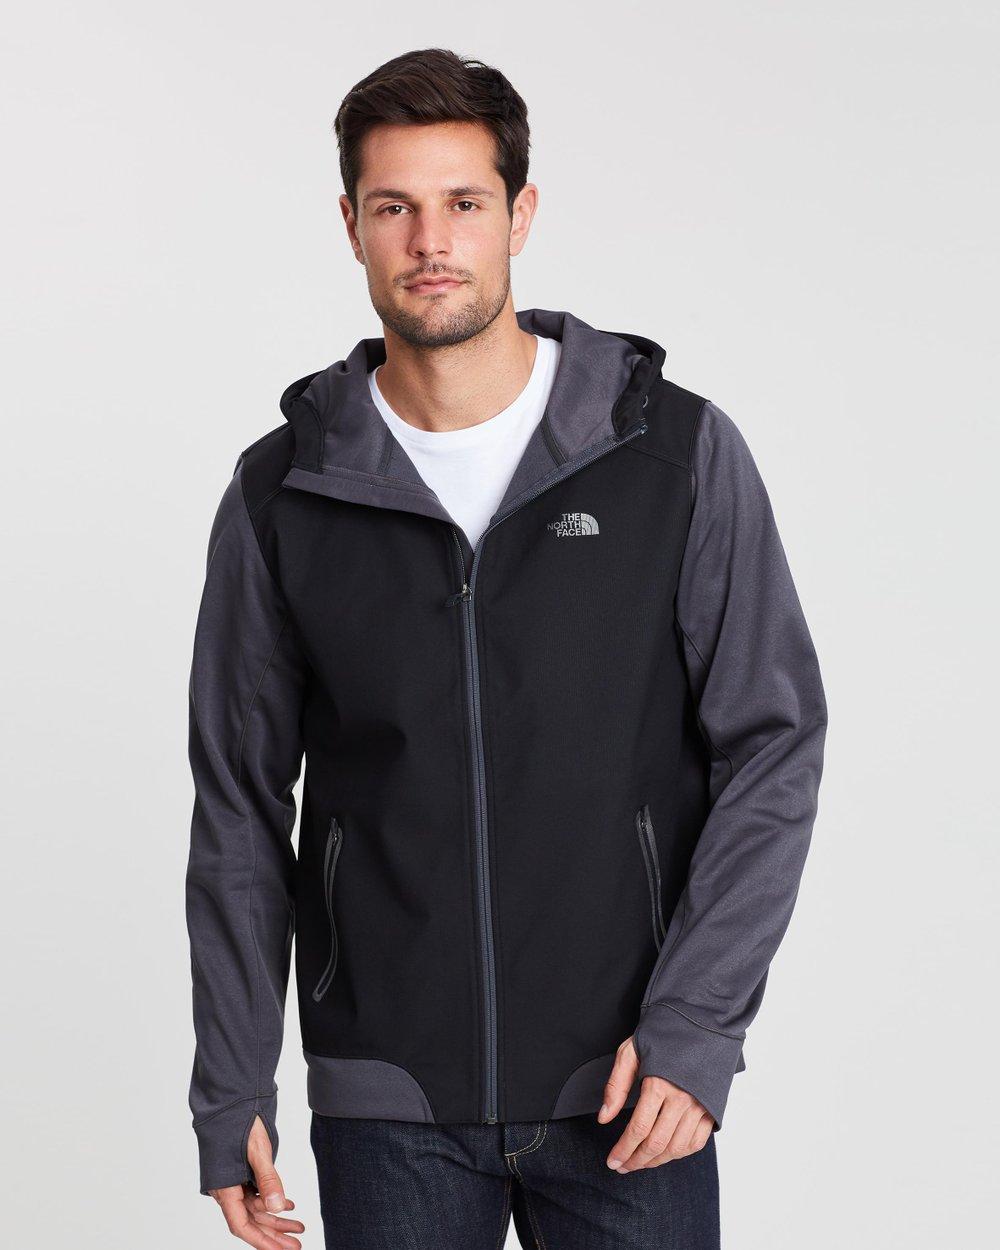 6ad60d44403c Kilowatt Varsity Jacket by The North Face Online